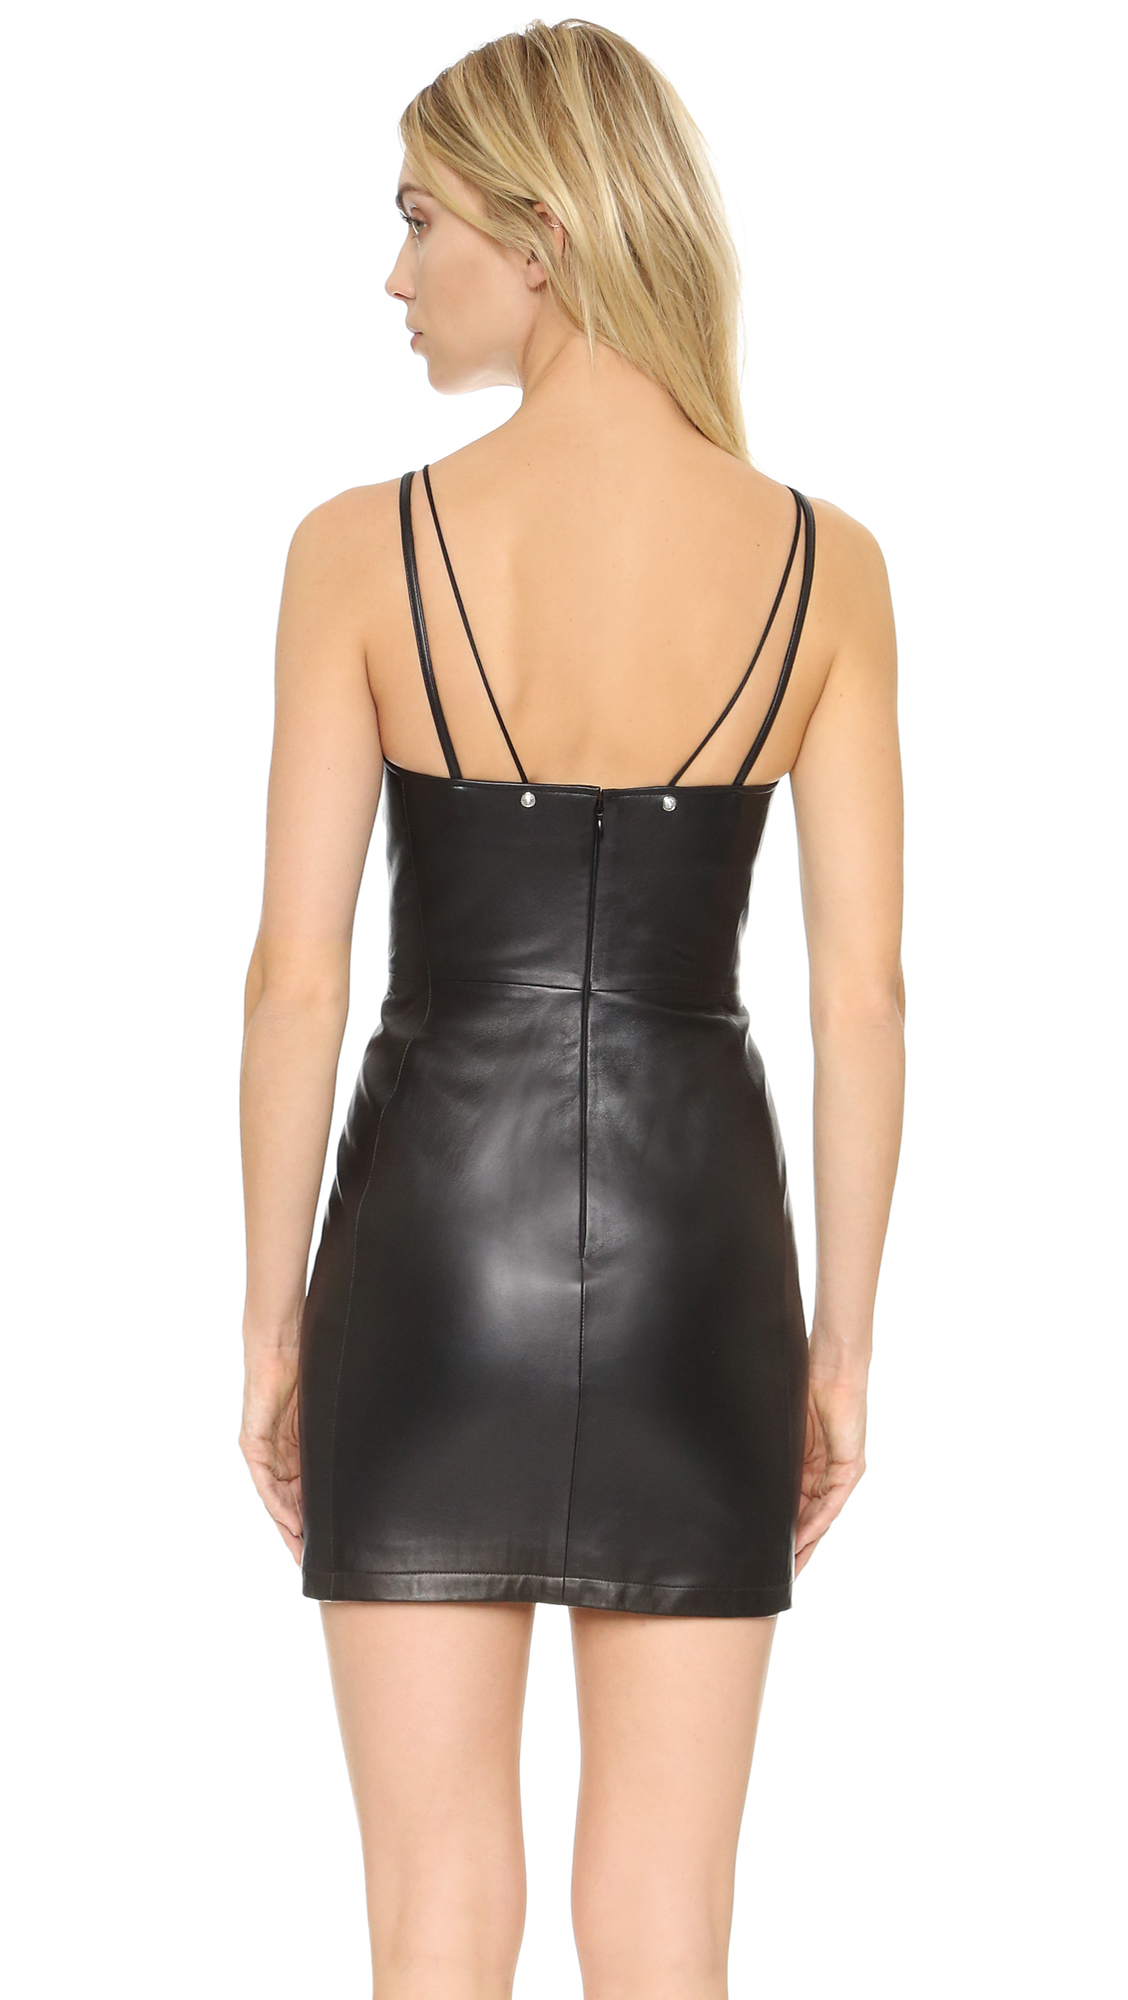 Versus Leather Mini Dress In Black Lyst